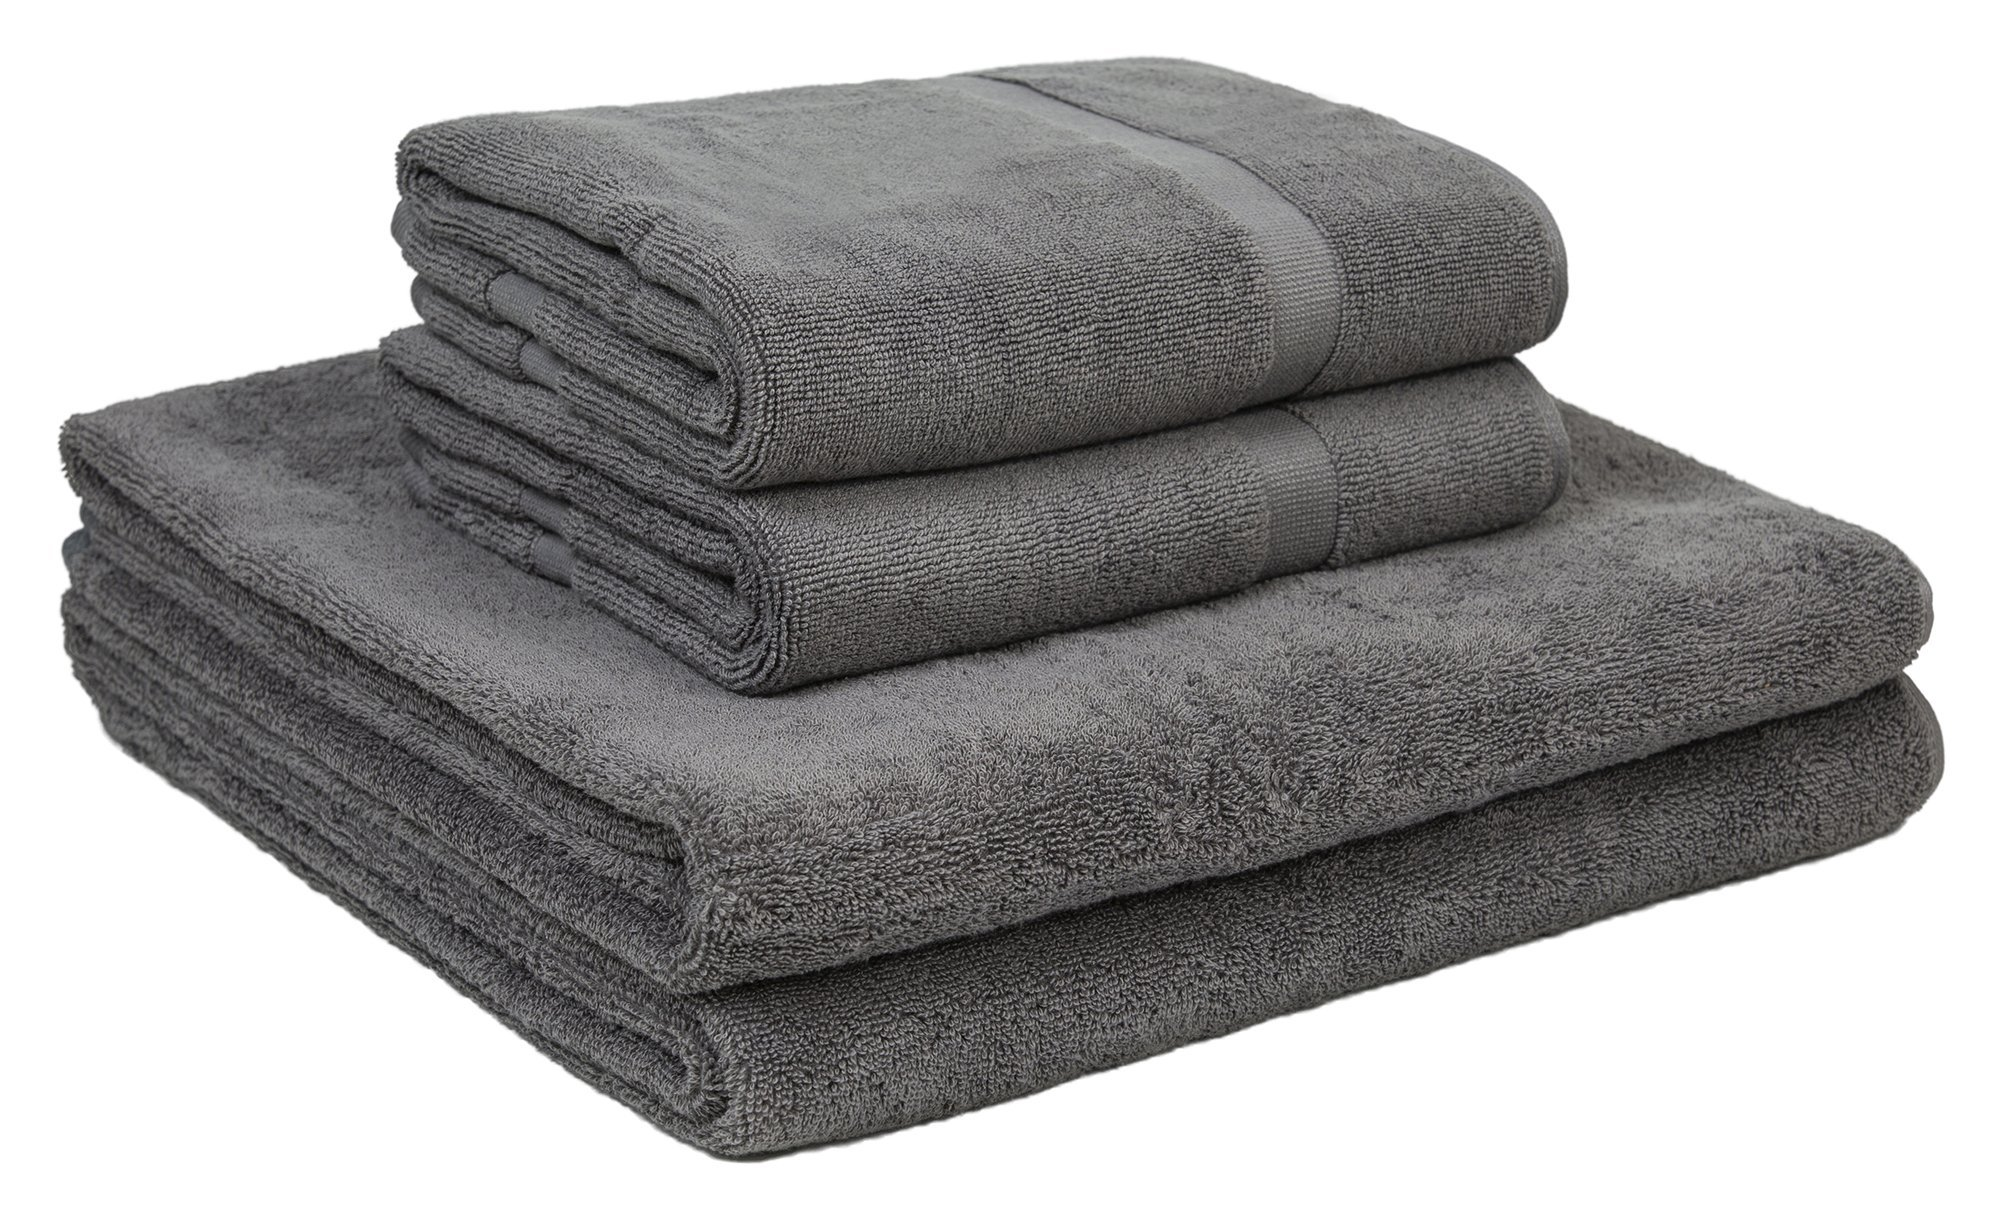 Home and Plan Quick Dry Premium 100% Turkish Cotton Bath Sheets & Bath Mats | 4-Piece Set, 2 Oversized Bath Towels (30x60), 2 Bath Mats (20x34) - Grey (S6)